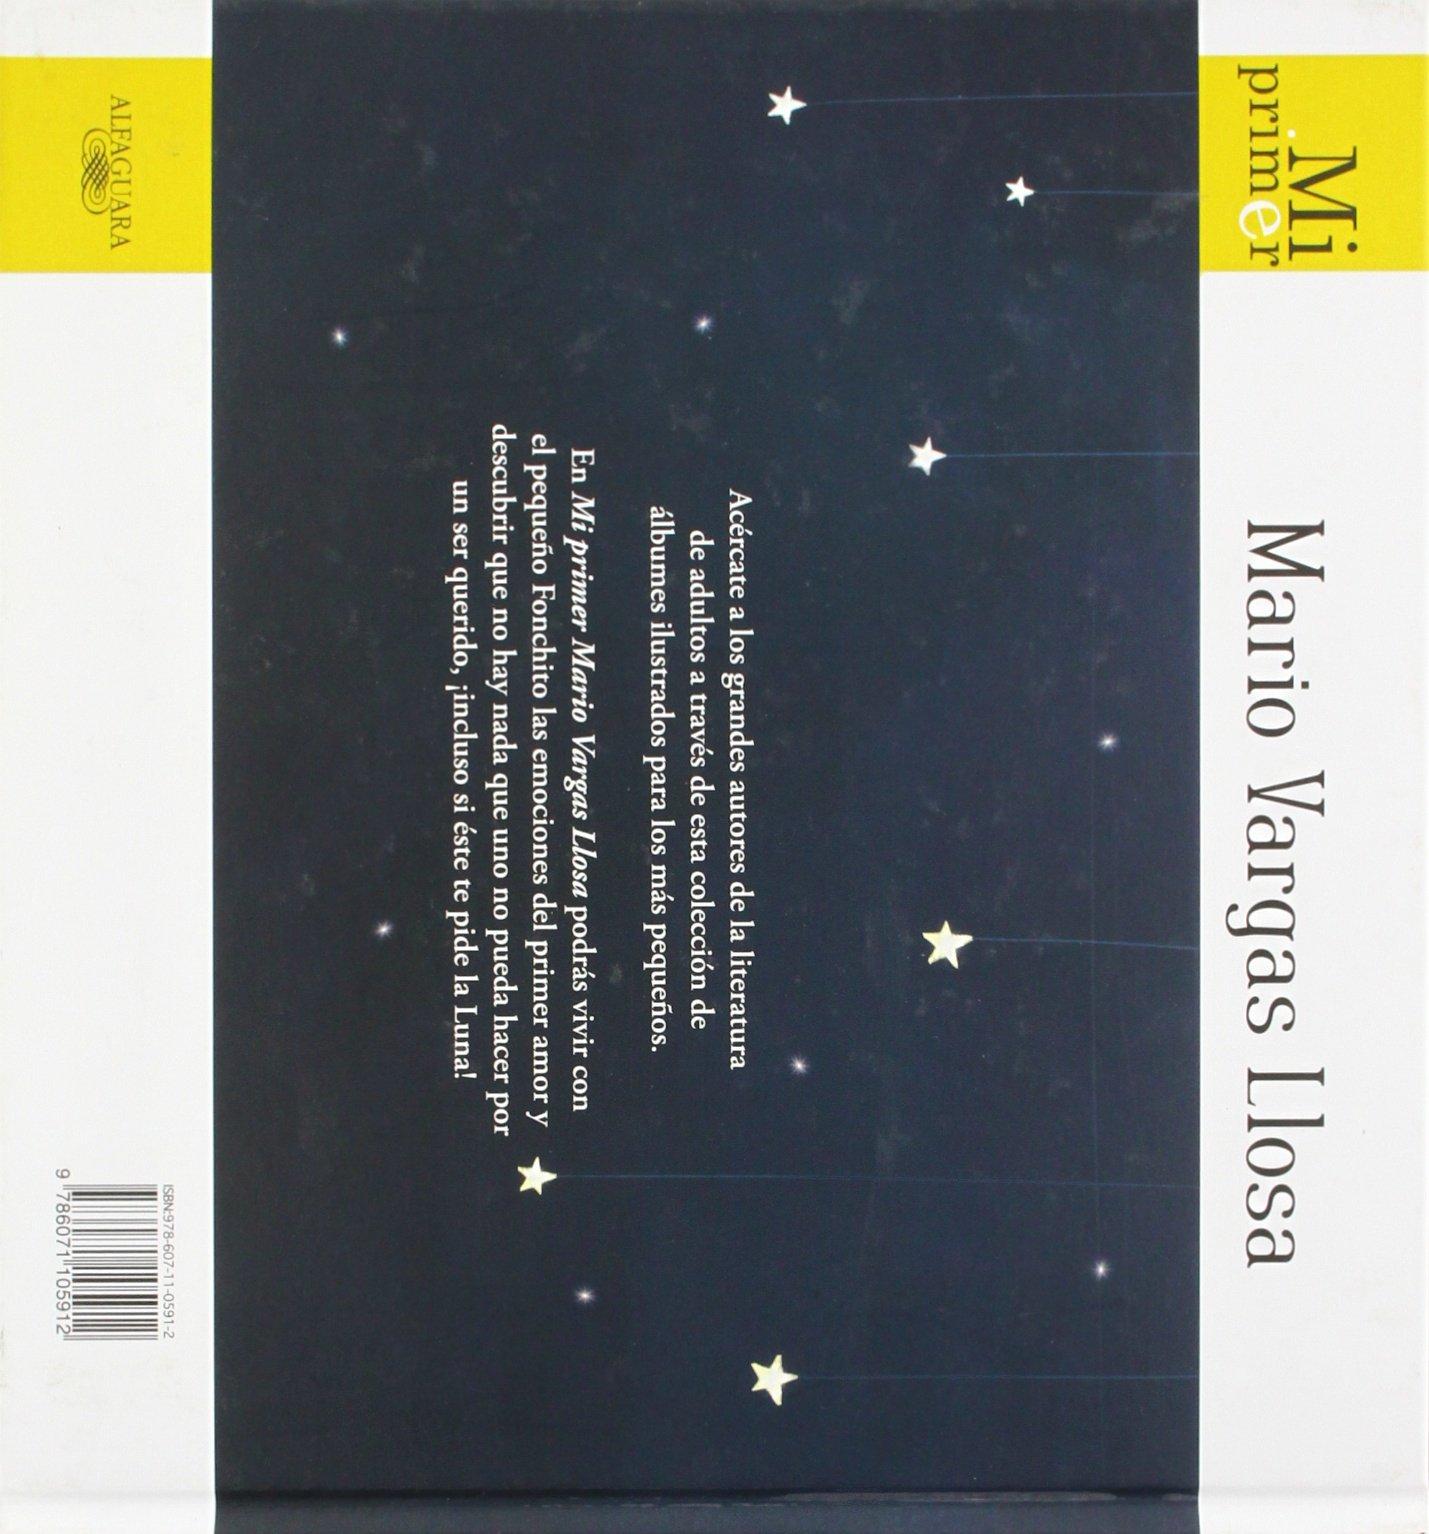 Mi Primer Mario Vargas Llosa: Fonchito Y La Luna (spanish Edition): Mario  Vargas Llosa: 9786071105912: Amazon: Books